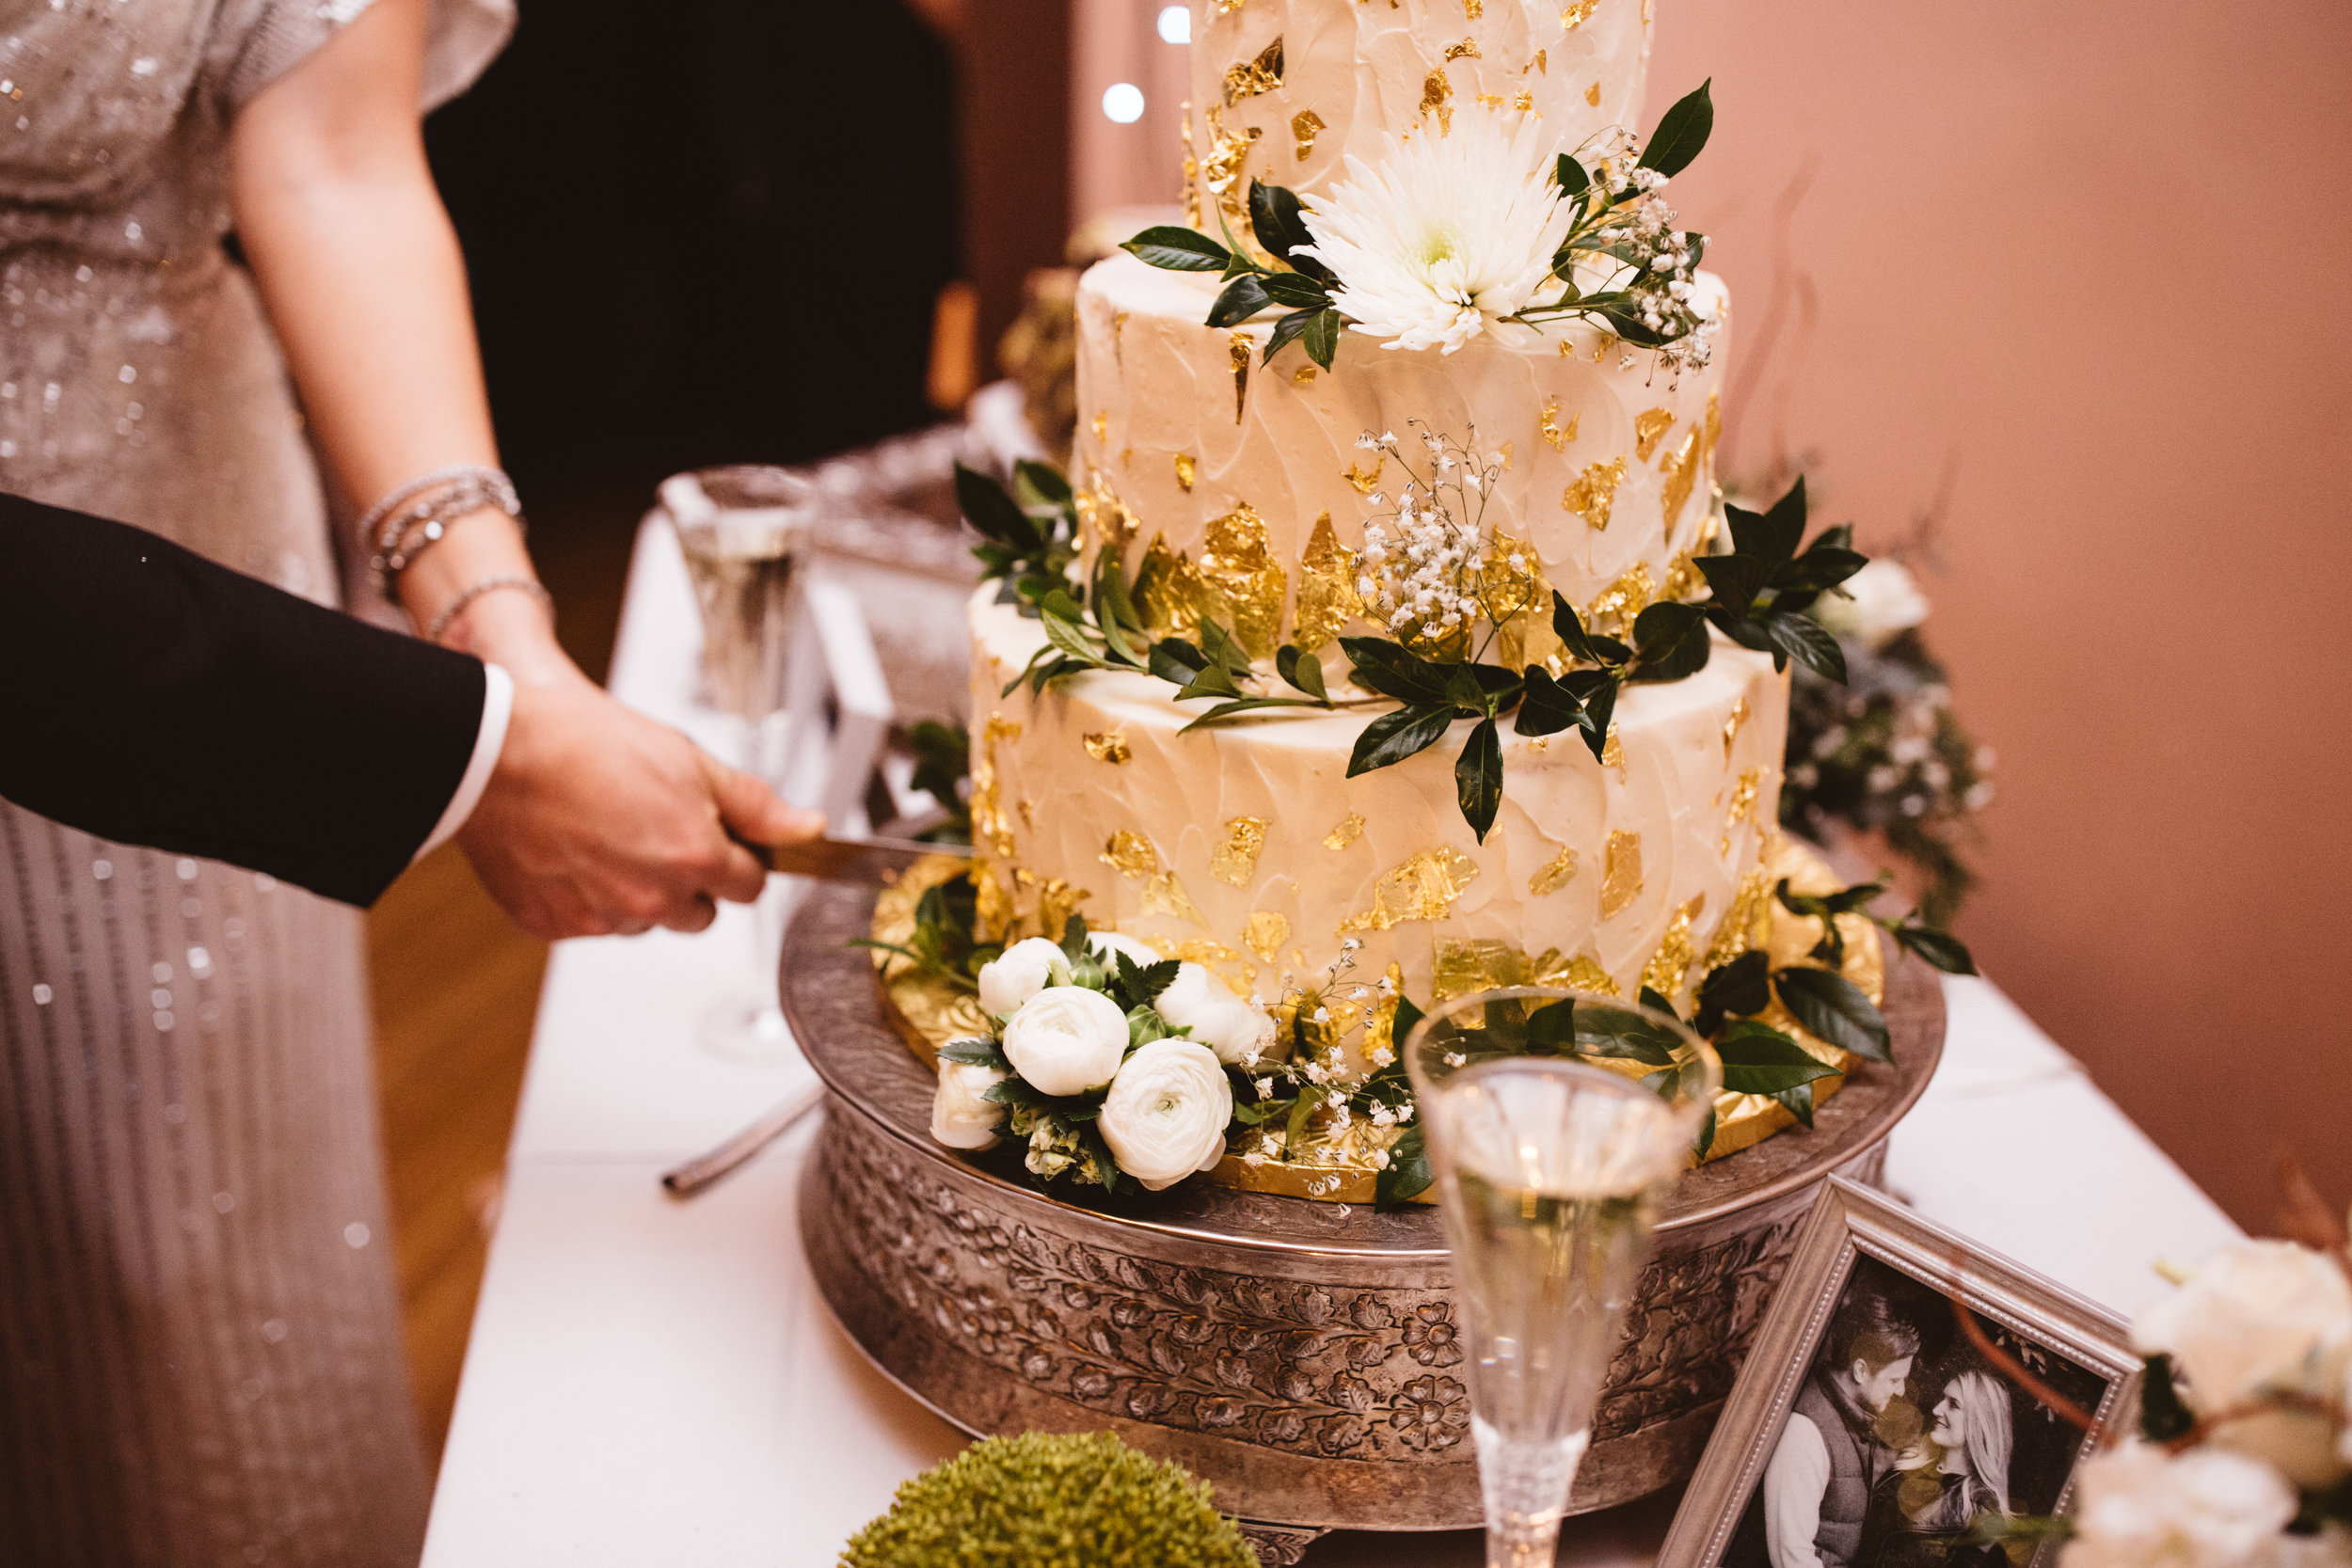 Mattie Bell Photography- Kelly & Zack Wedding Atlanta Brewery -398.jpg